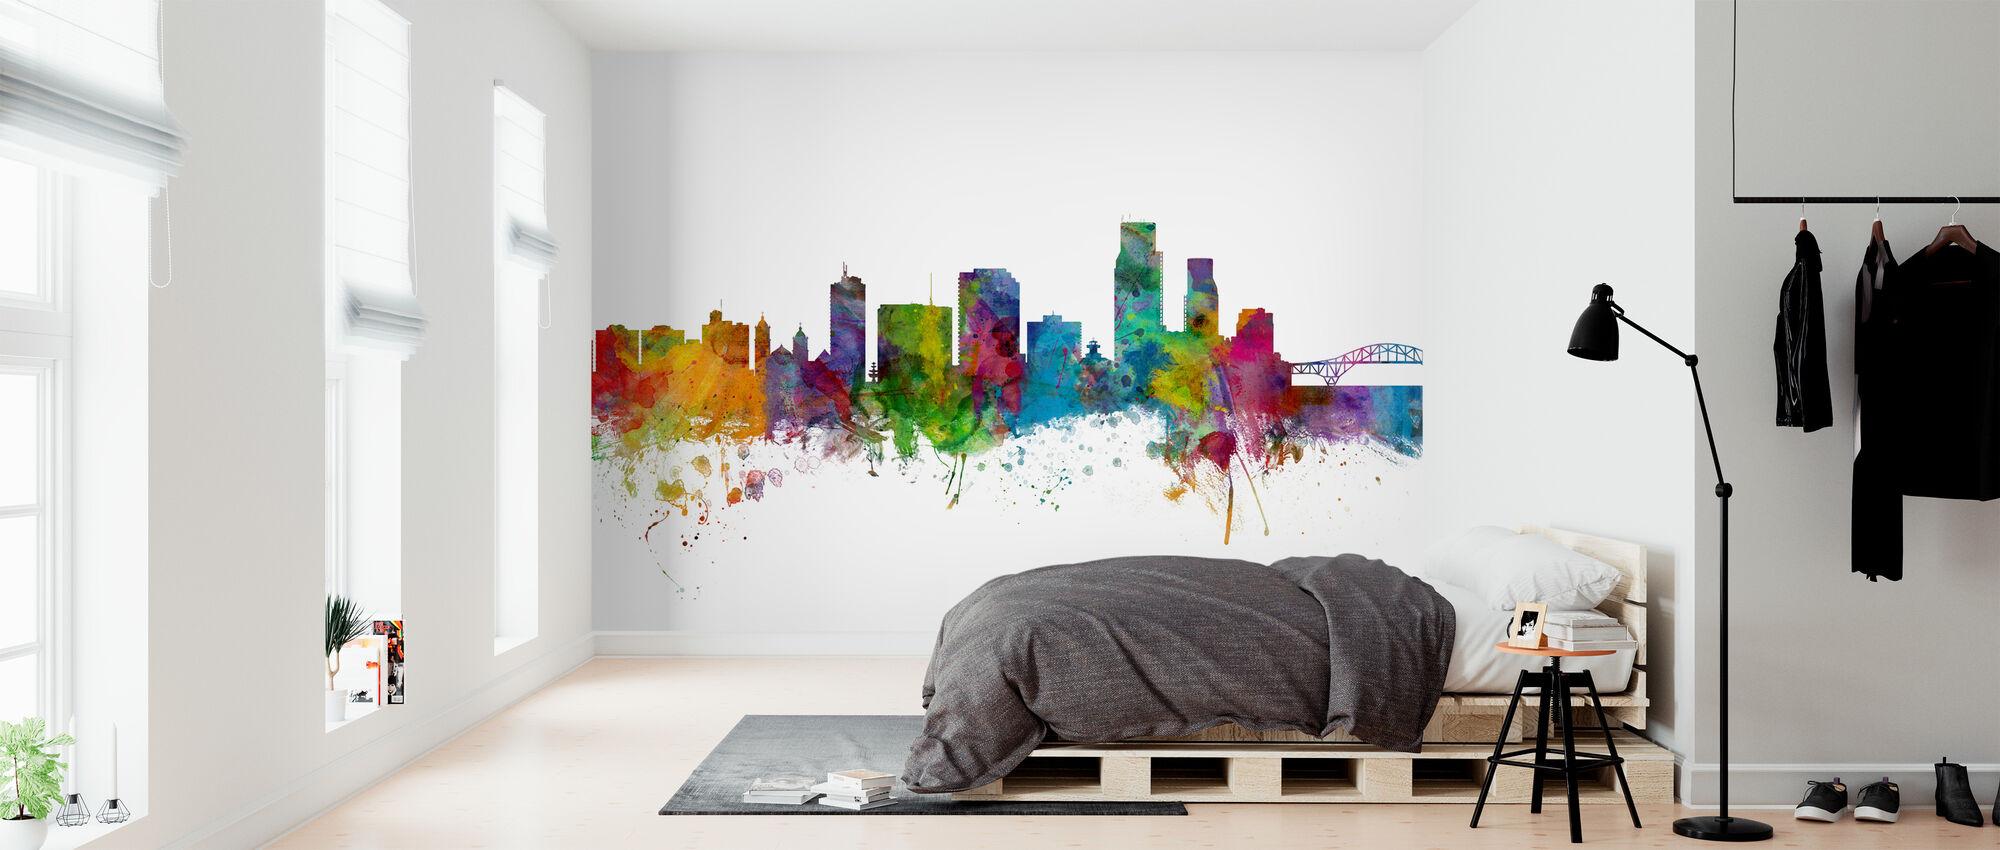 Corpus Christie Texas Skyline - Wallpaper - Bedroom